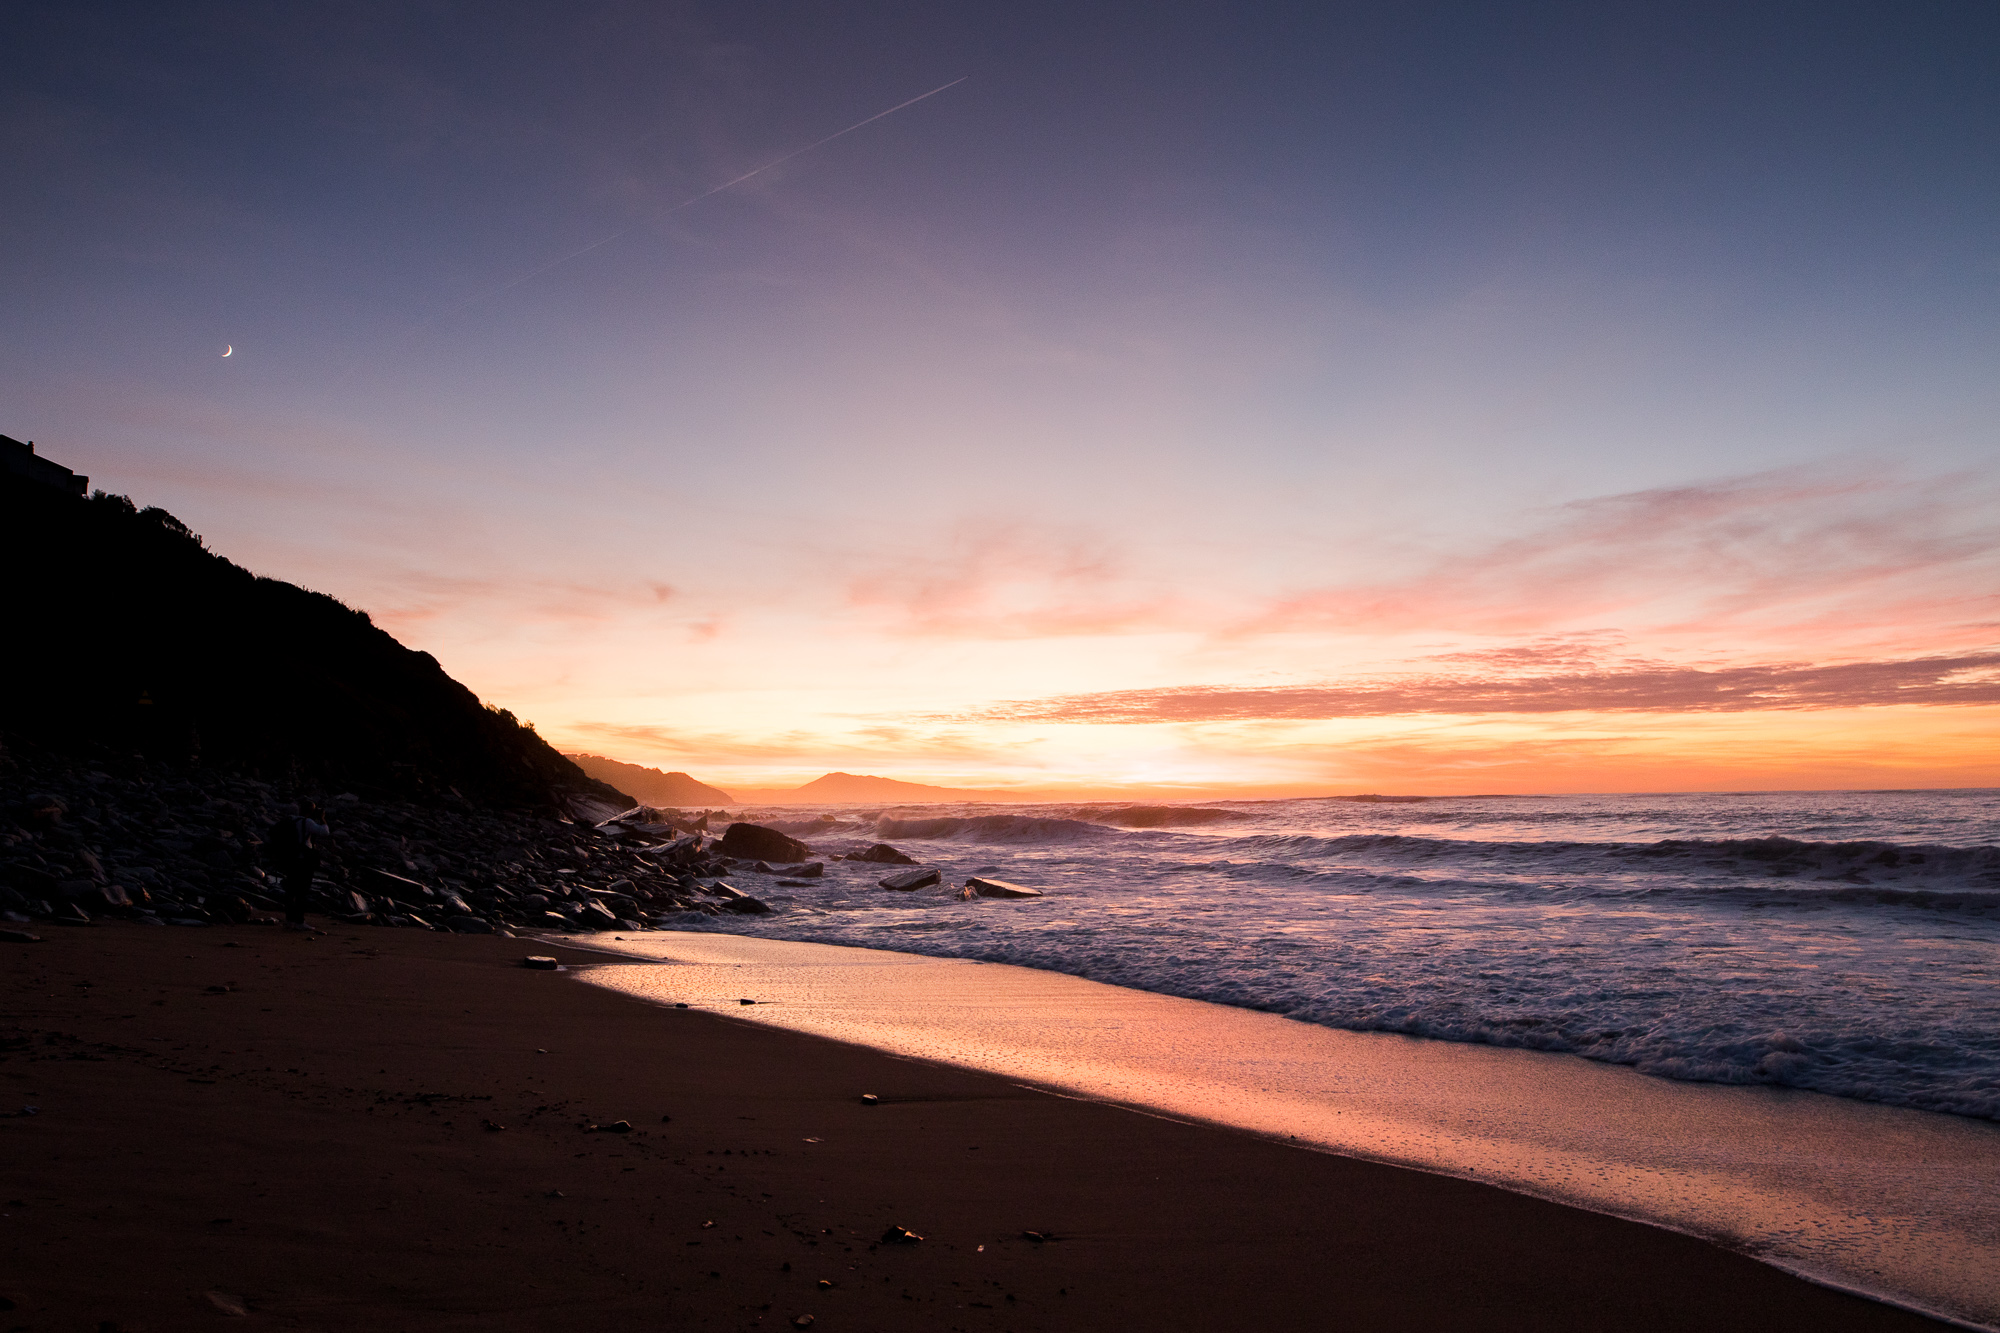 Nature mer Cote basque sunset